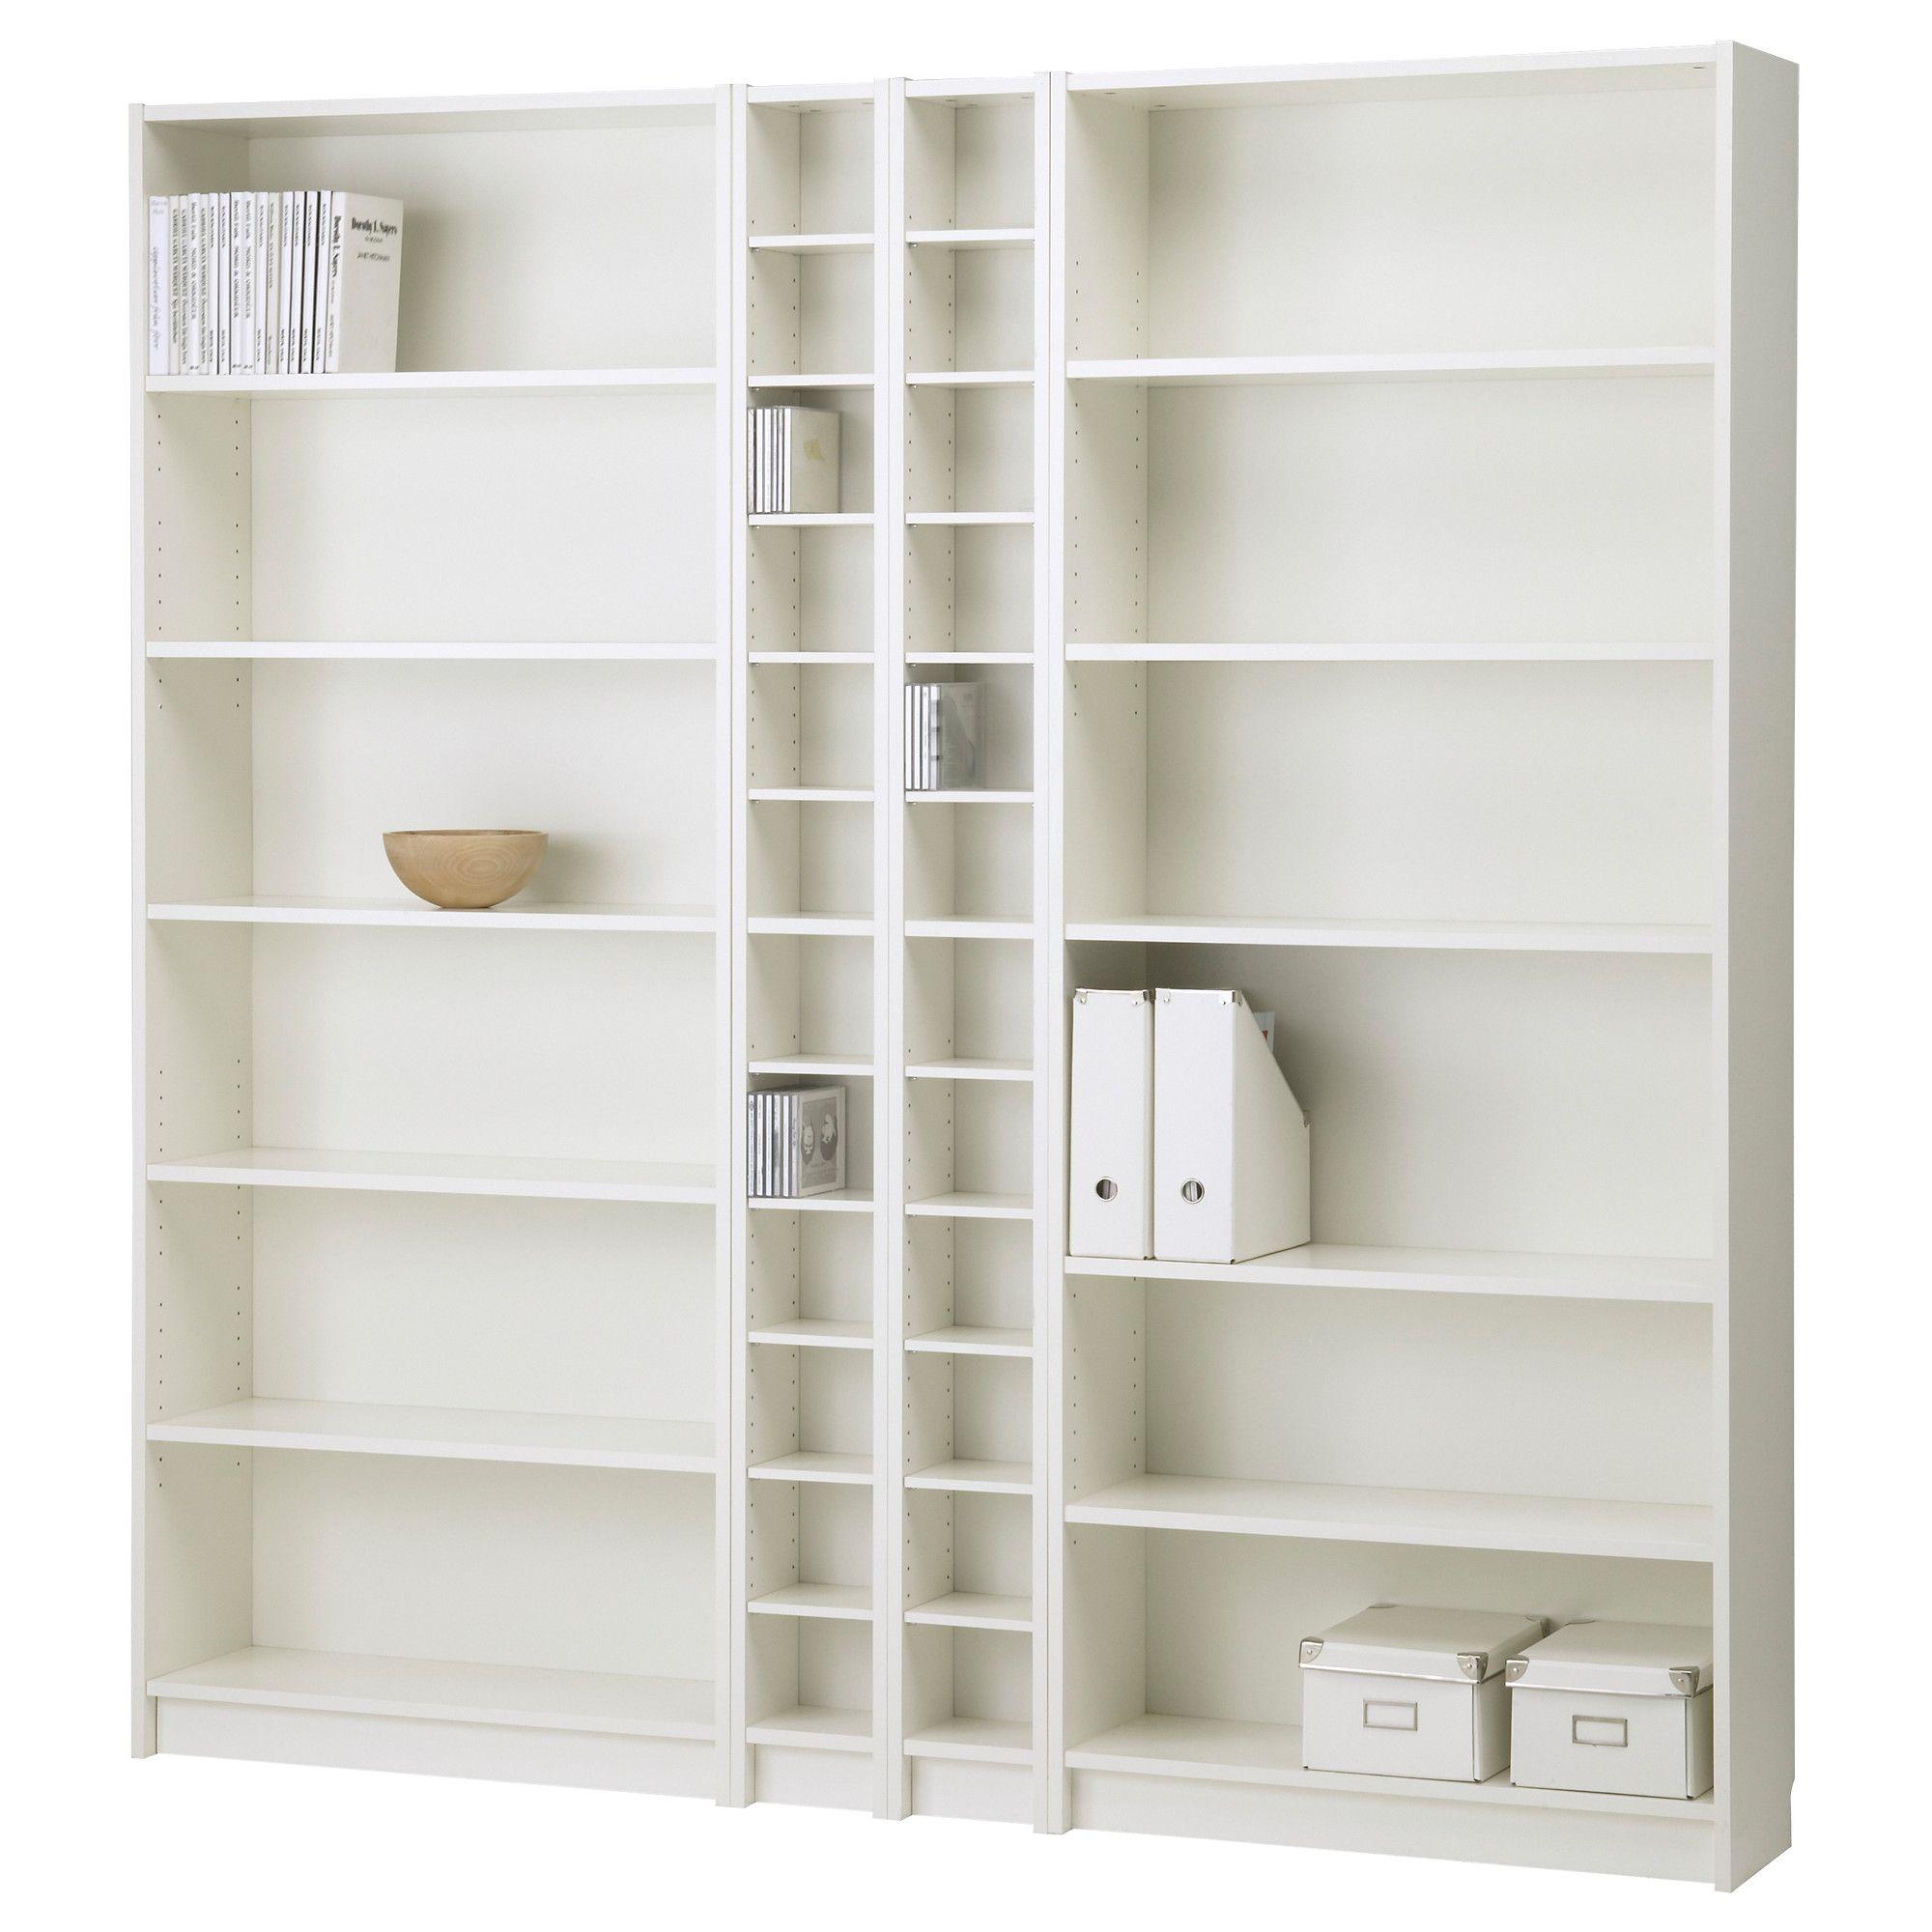 BILLY/BENNO Bookcase combination - white - IKEA  78 3/4 x 79 1/2  $197